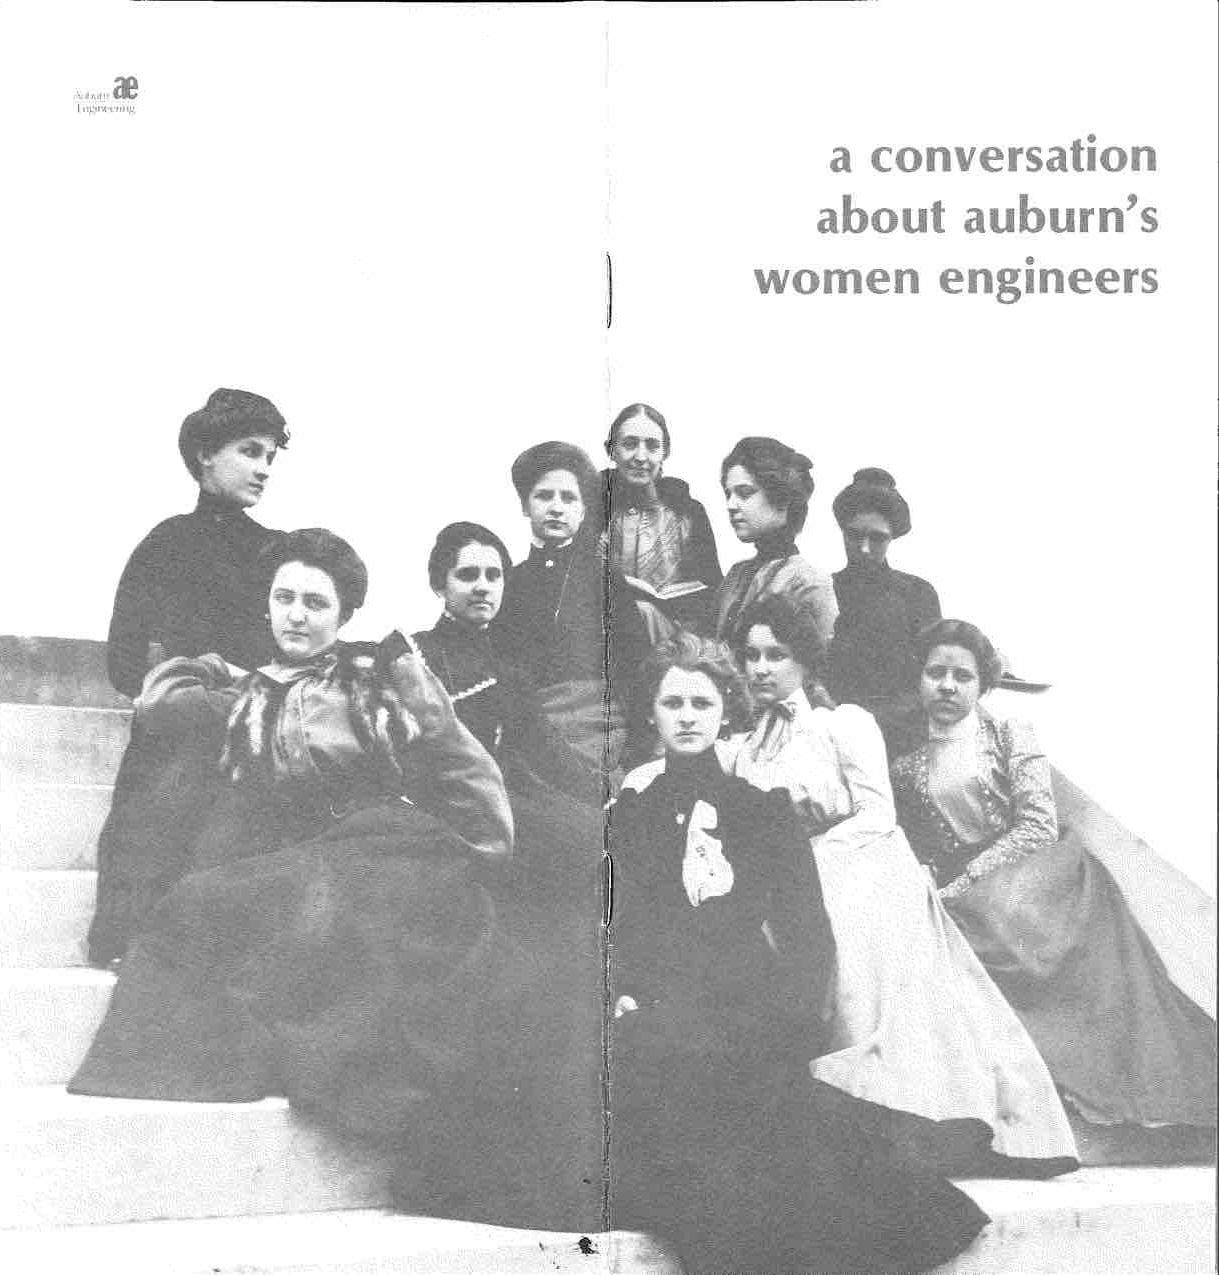 Photo of original woman engineers